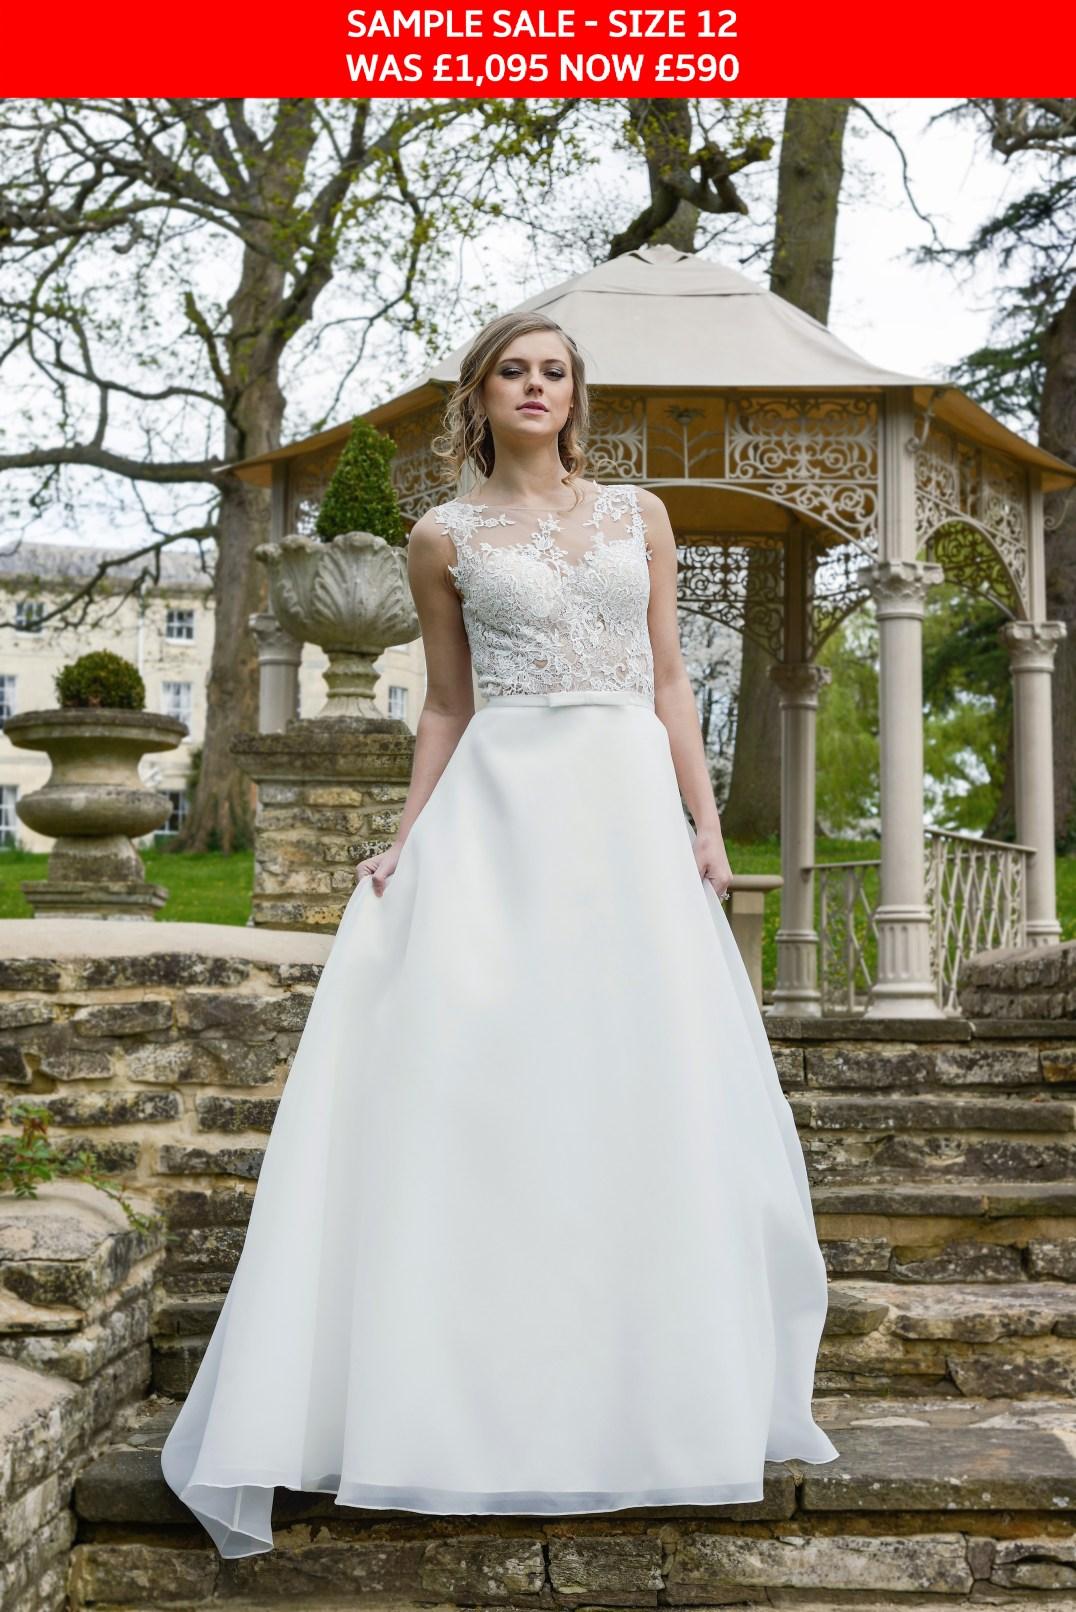 GAIA Cara wedding gown sample sale